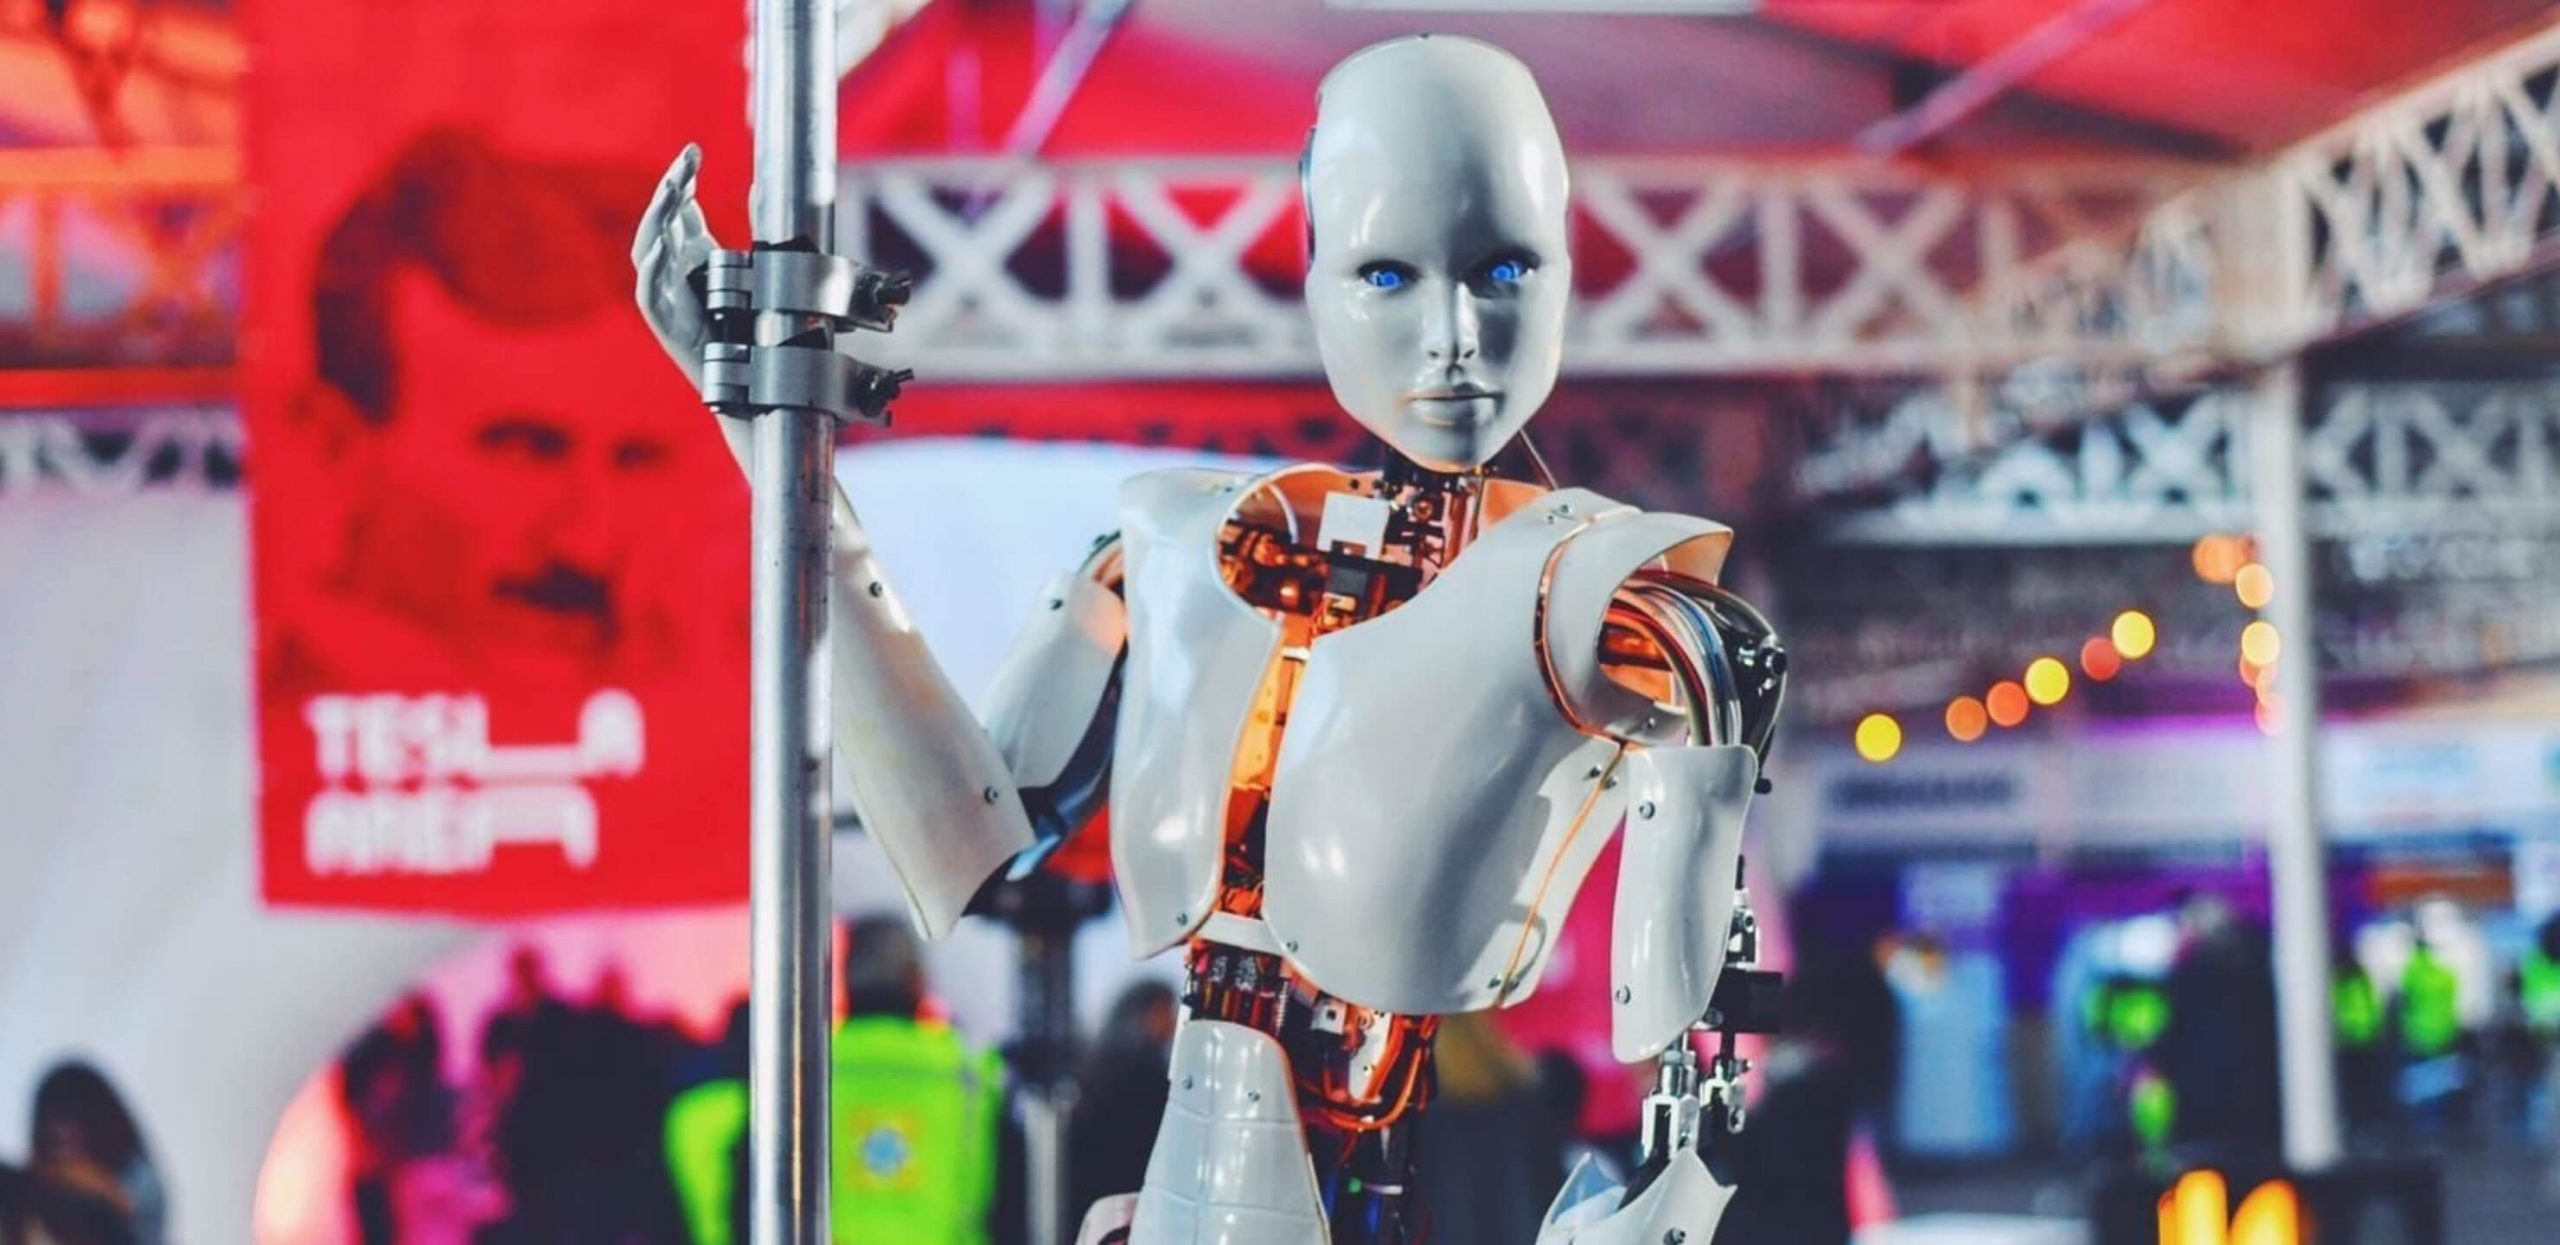 Dance Cyborg